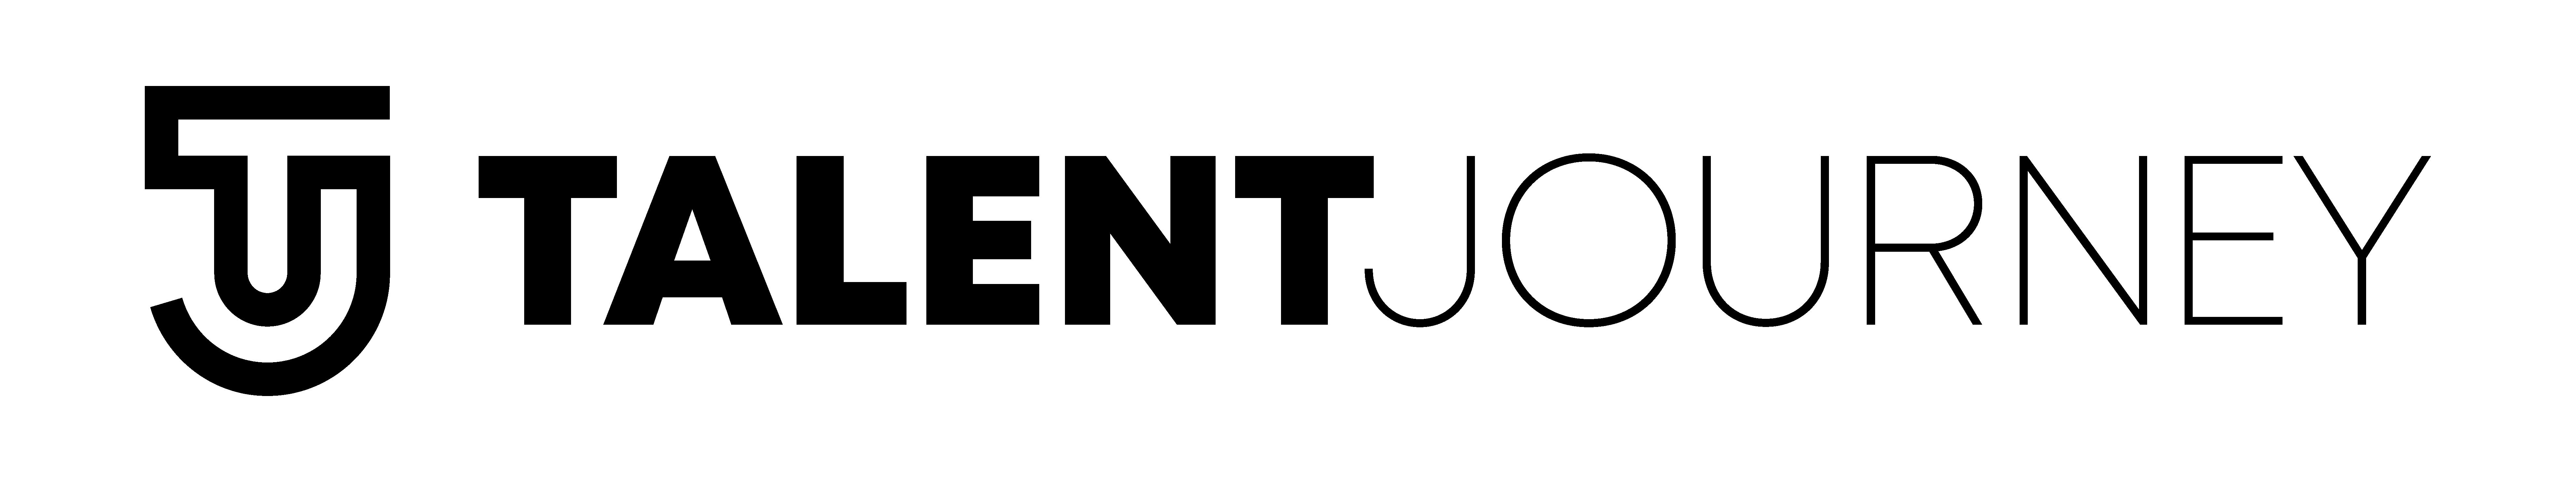 TalentJourney_Black_Logo-03